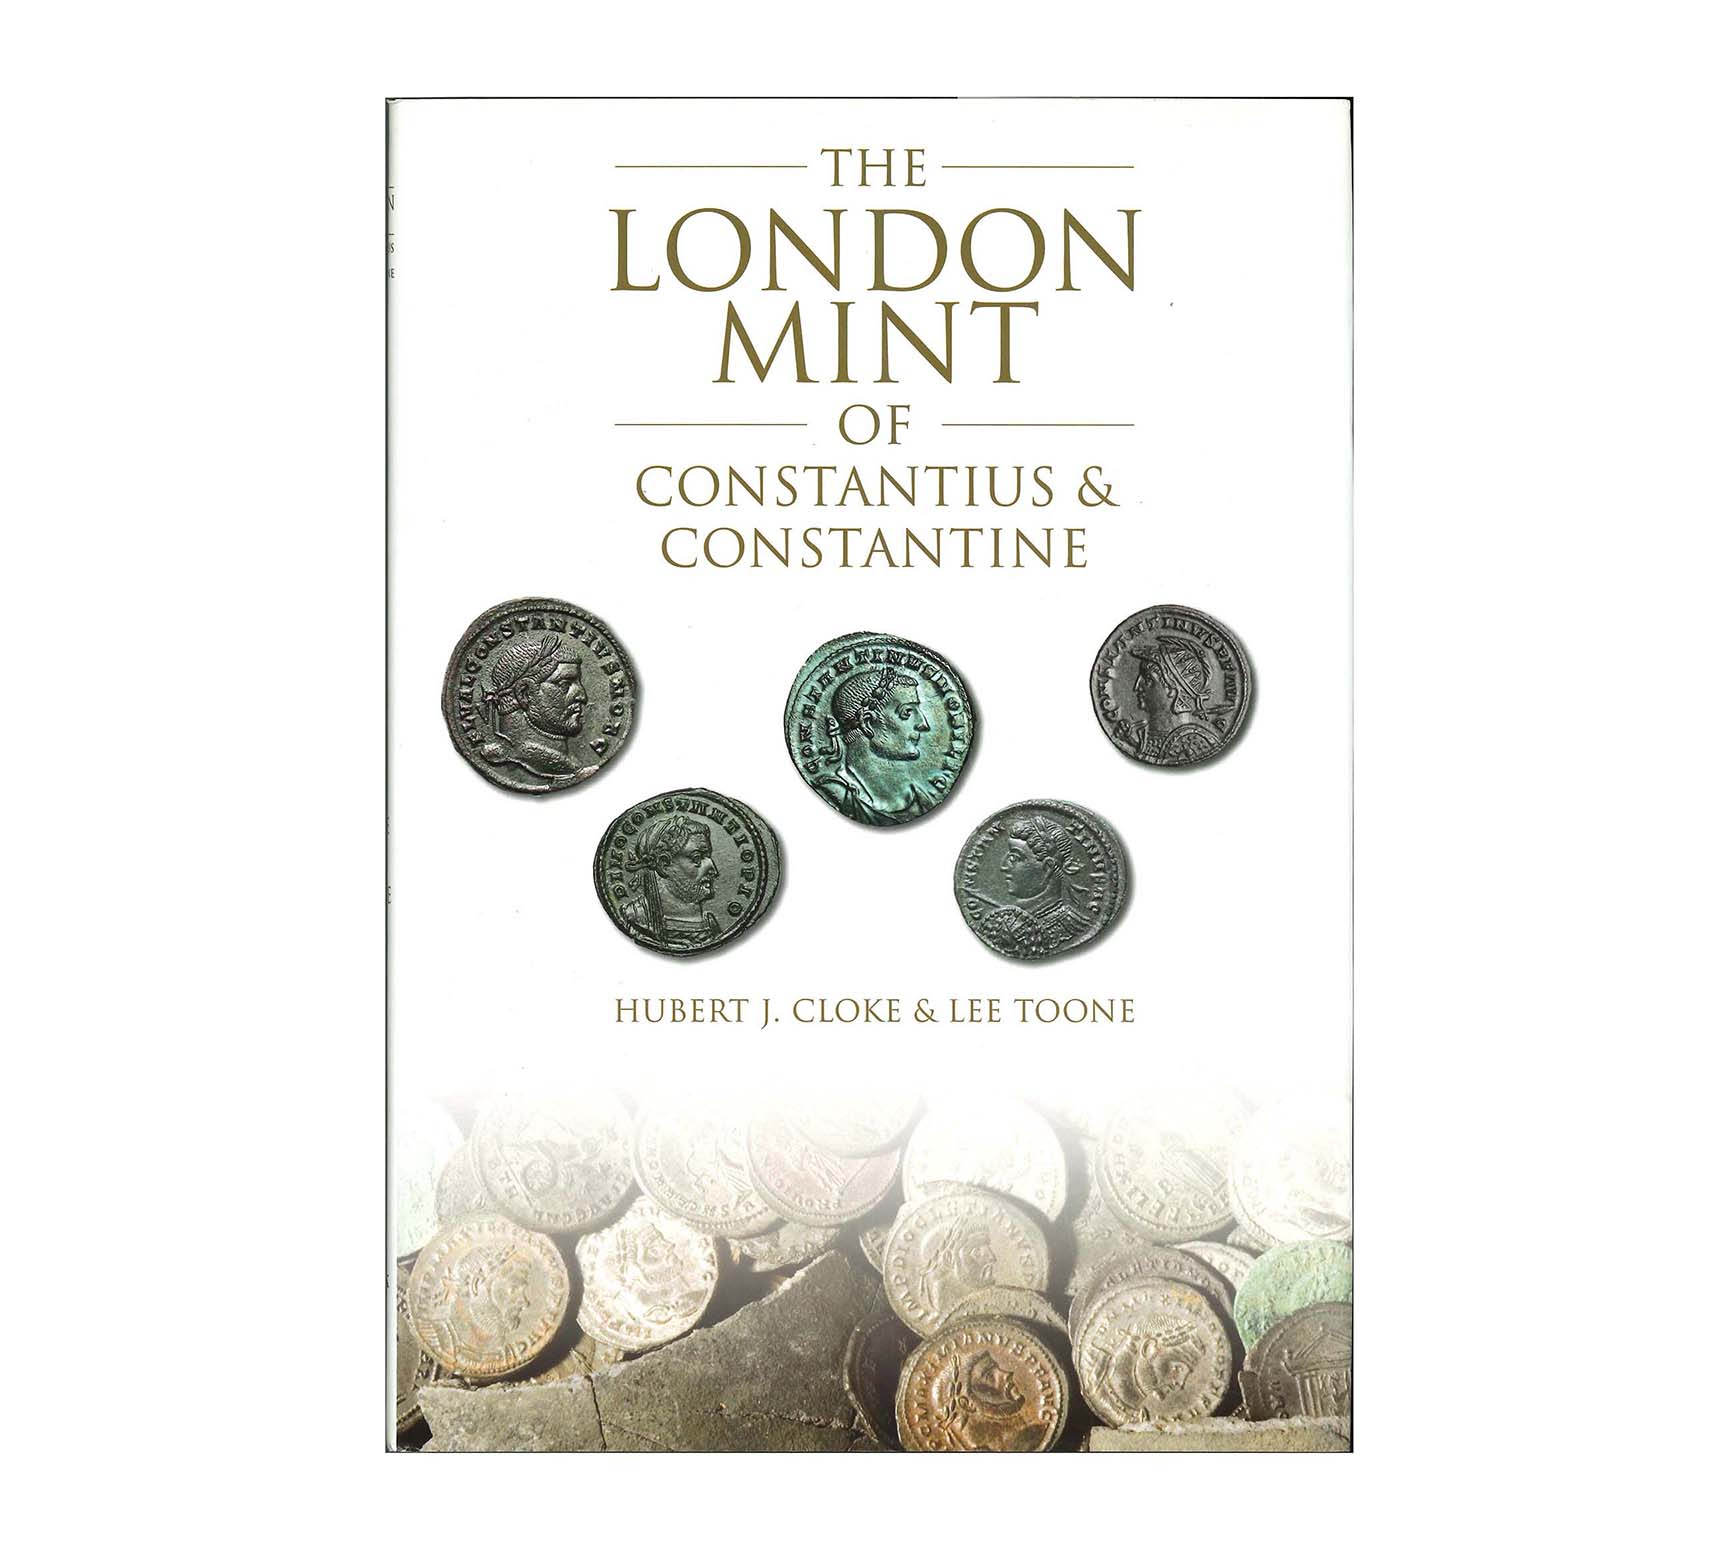 The London Mint of Constantius & Constantine